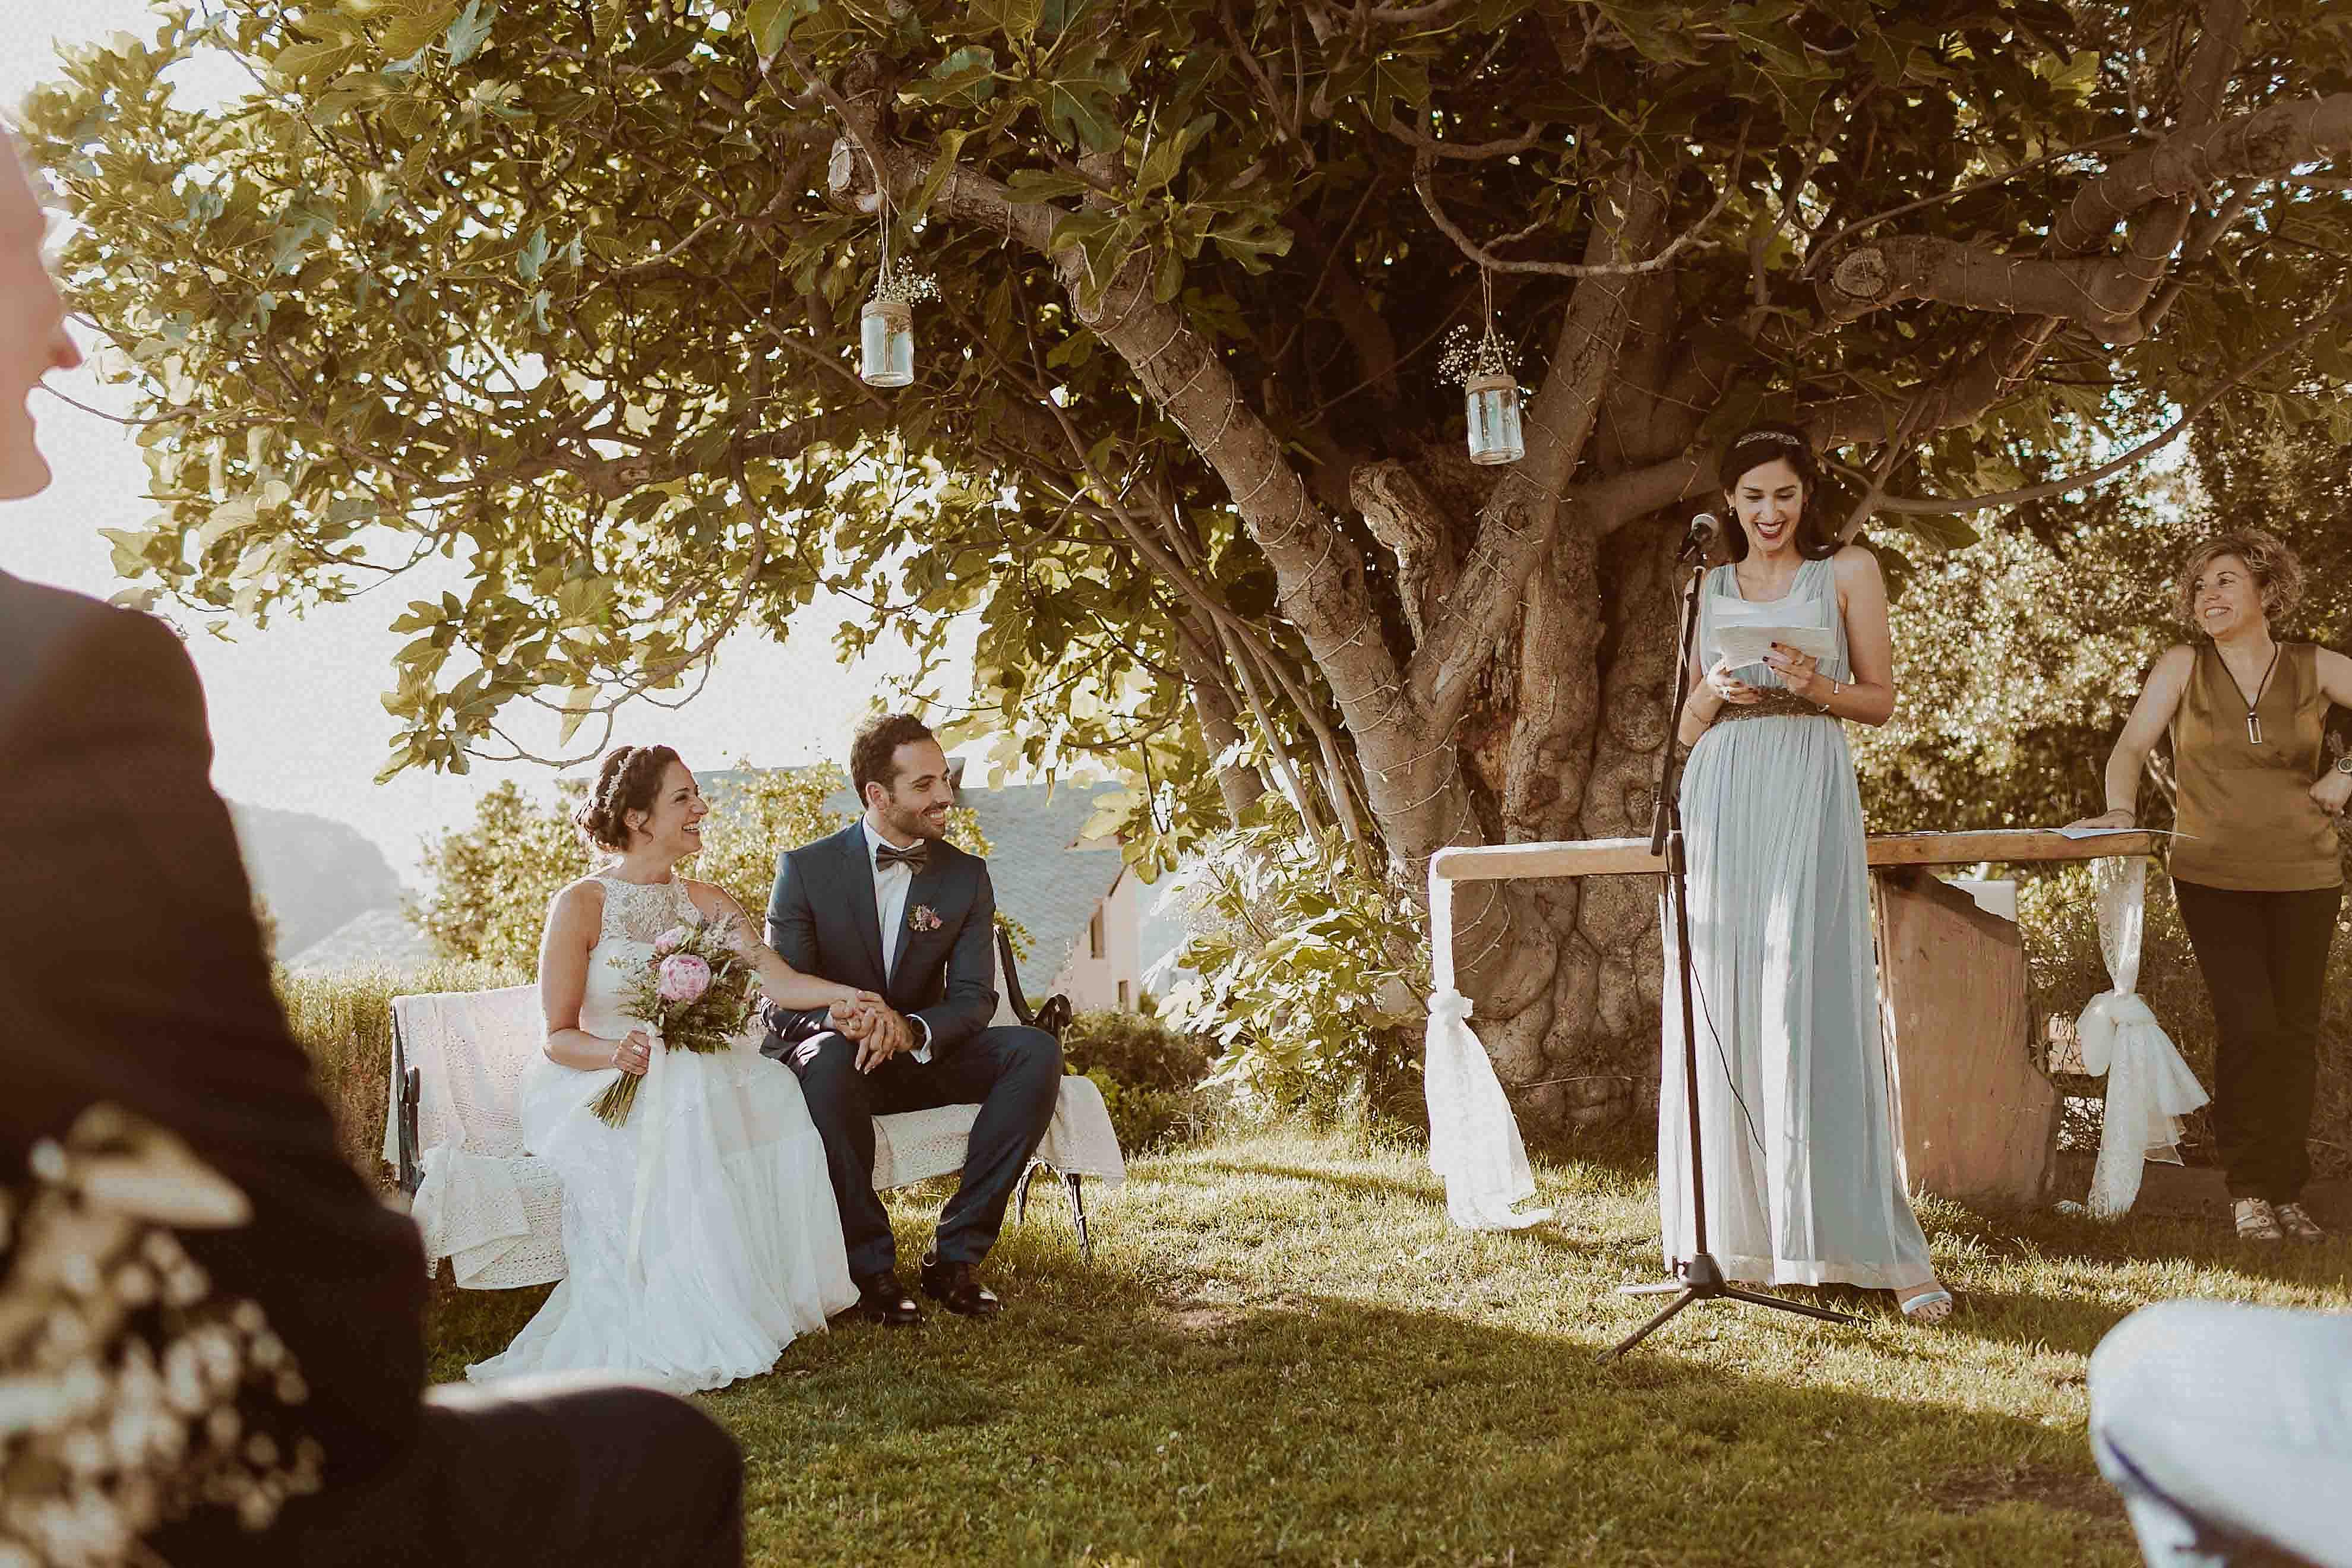 Boda rústica en la montaña. fotgrafo de bodas barcelona_052